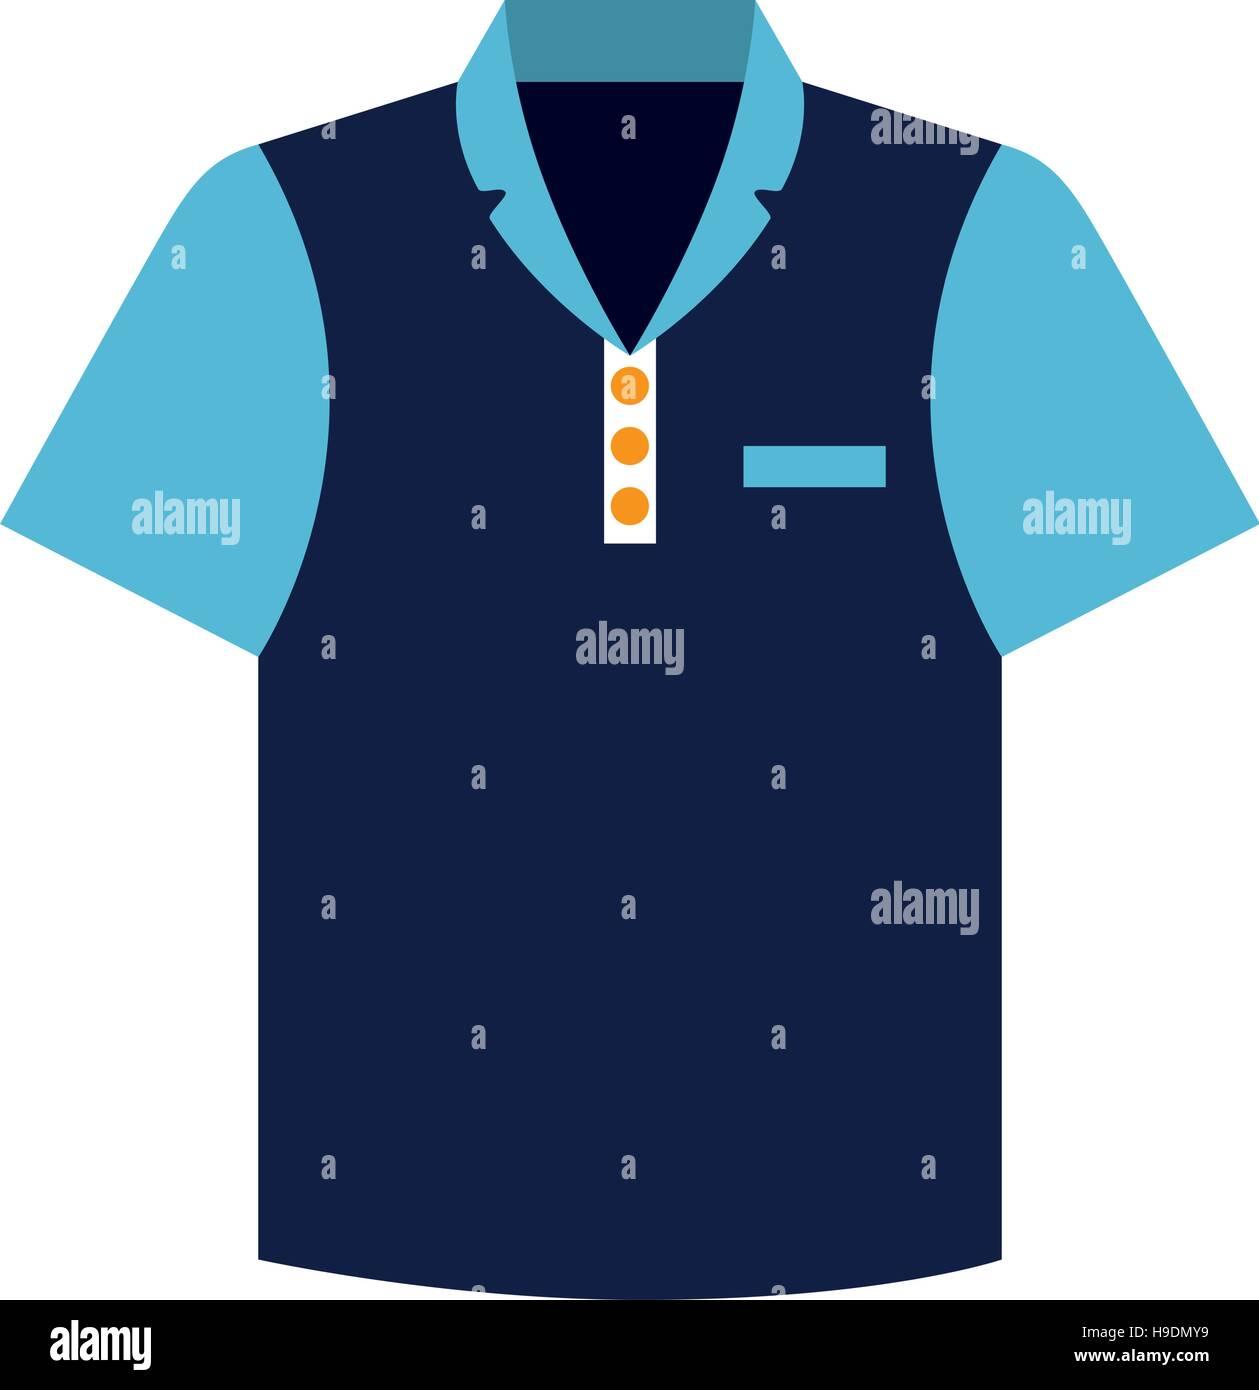 Shirt uniform design vector - Stock Vector Tennis Shirt Uniform Icon Vector Illustration Design